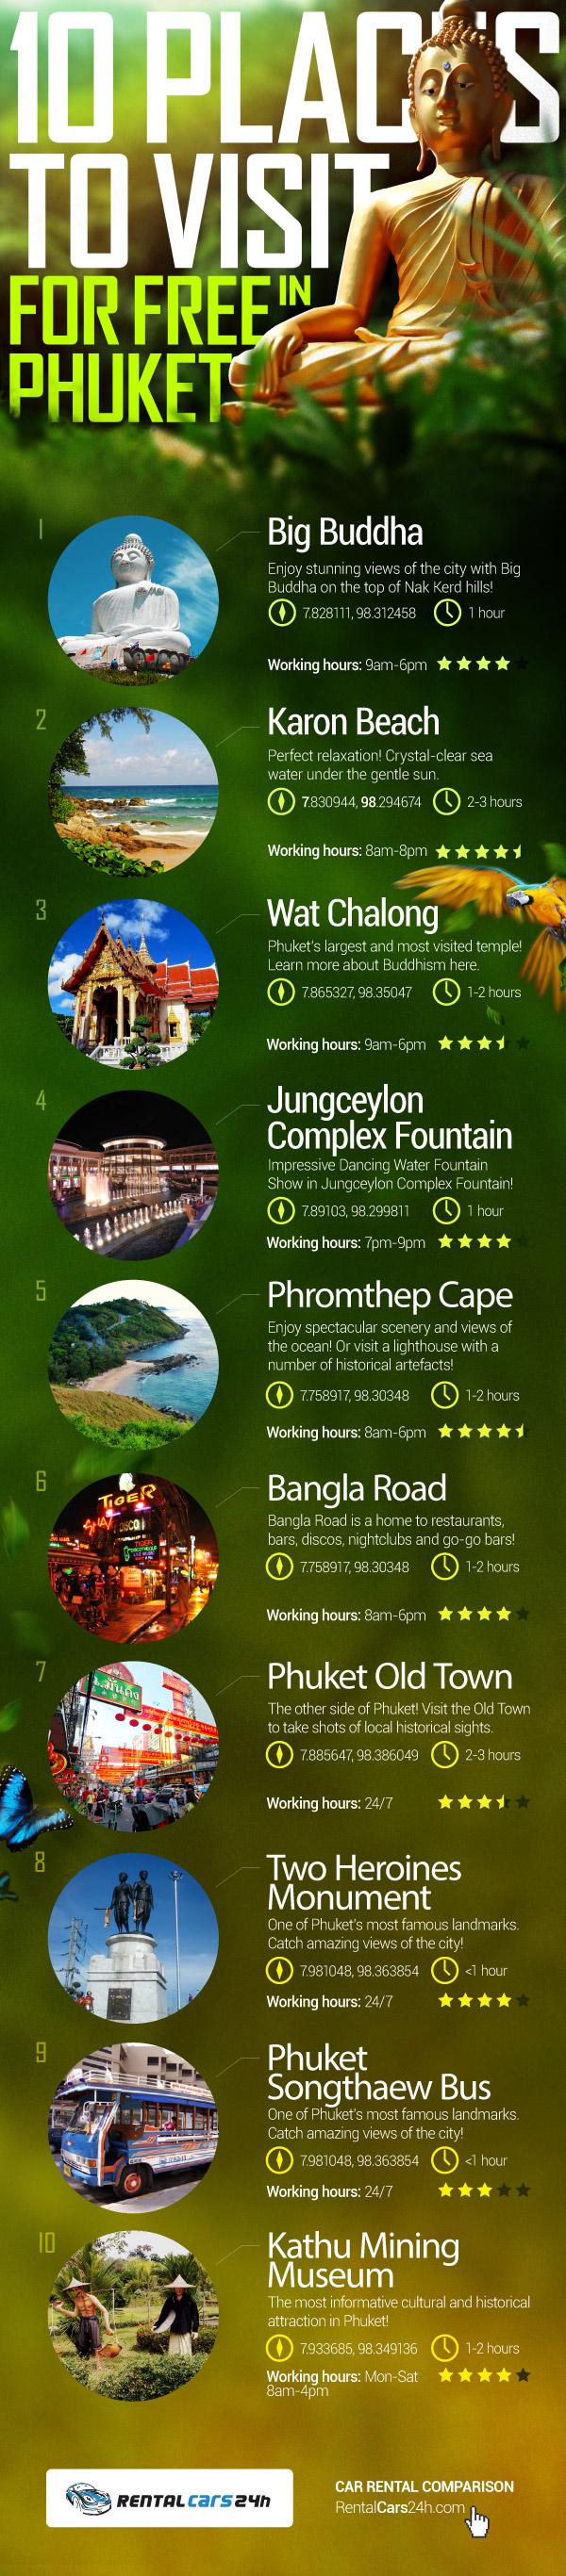 Phuket 10 Places To Visit For FREE in Phuket!